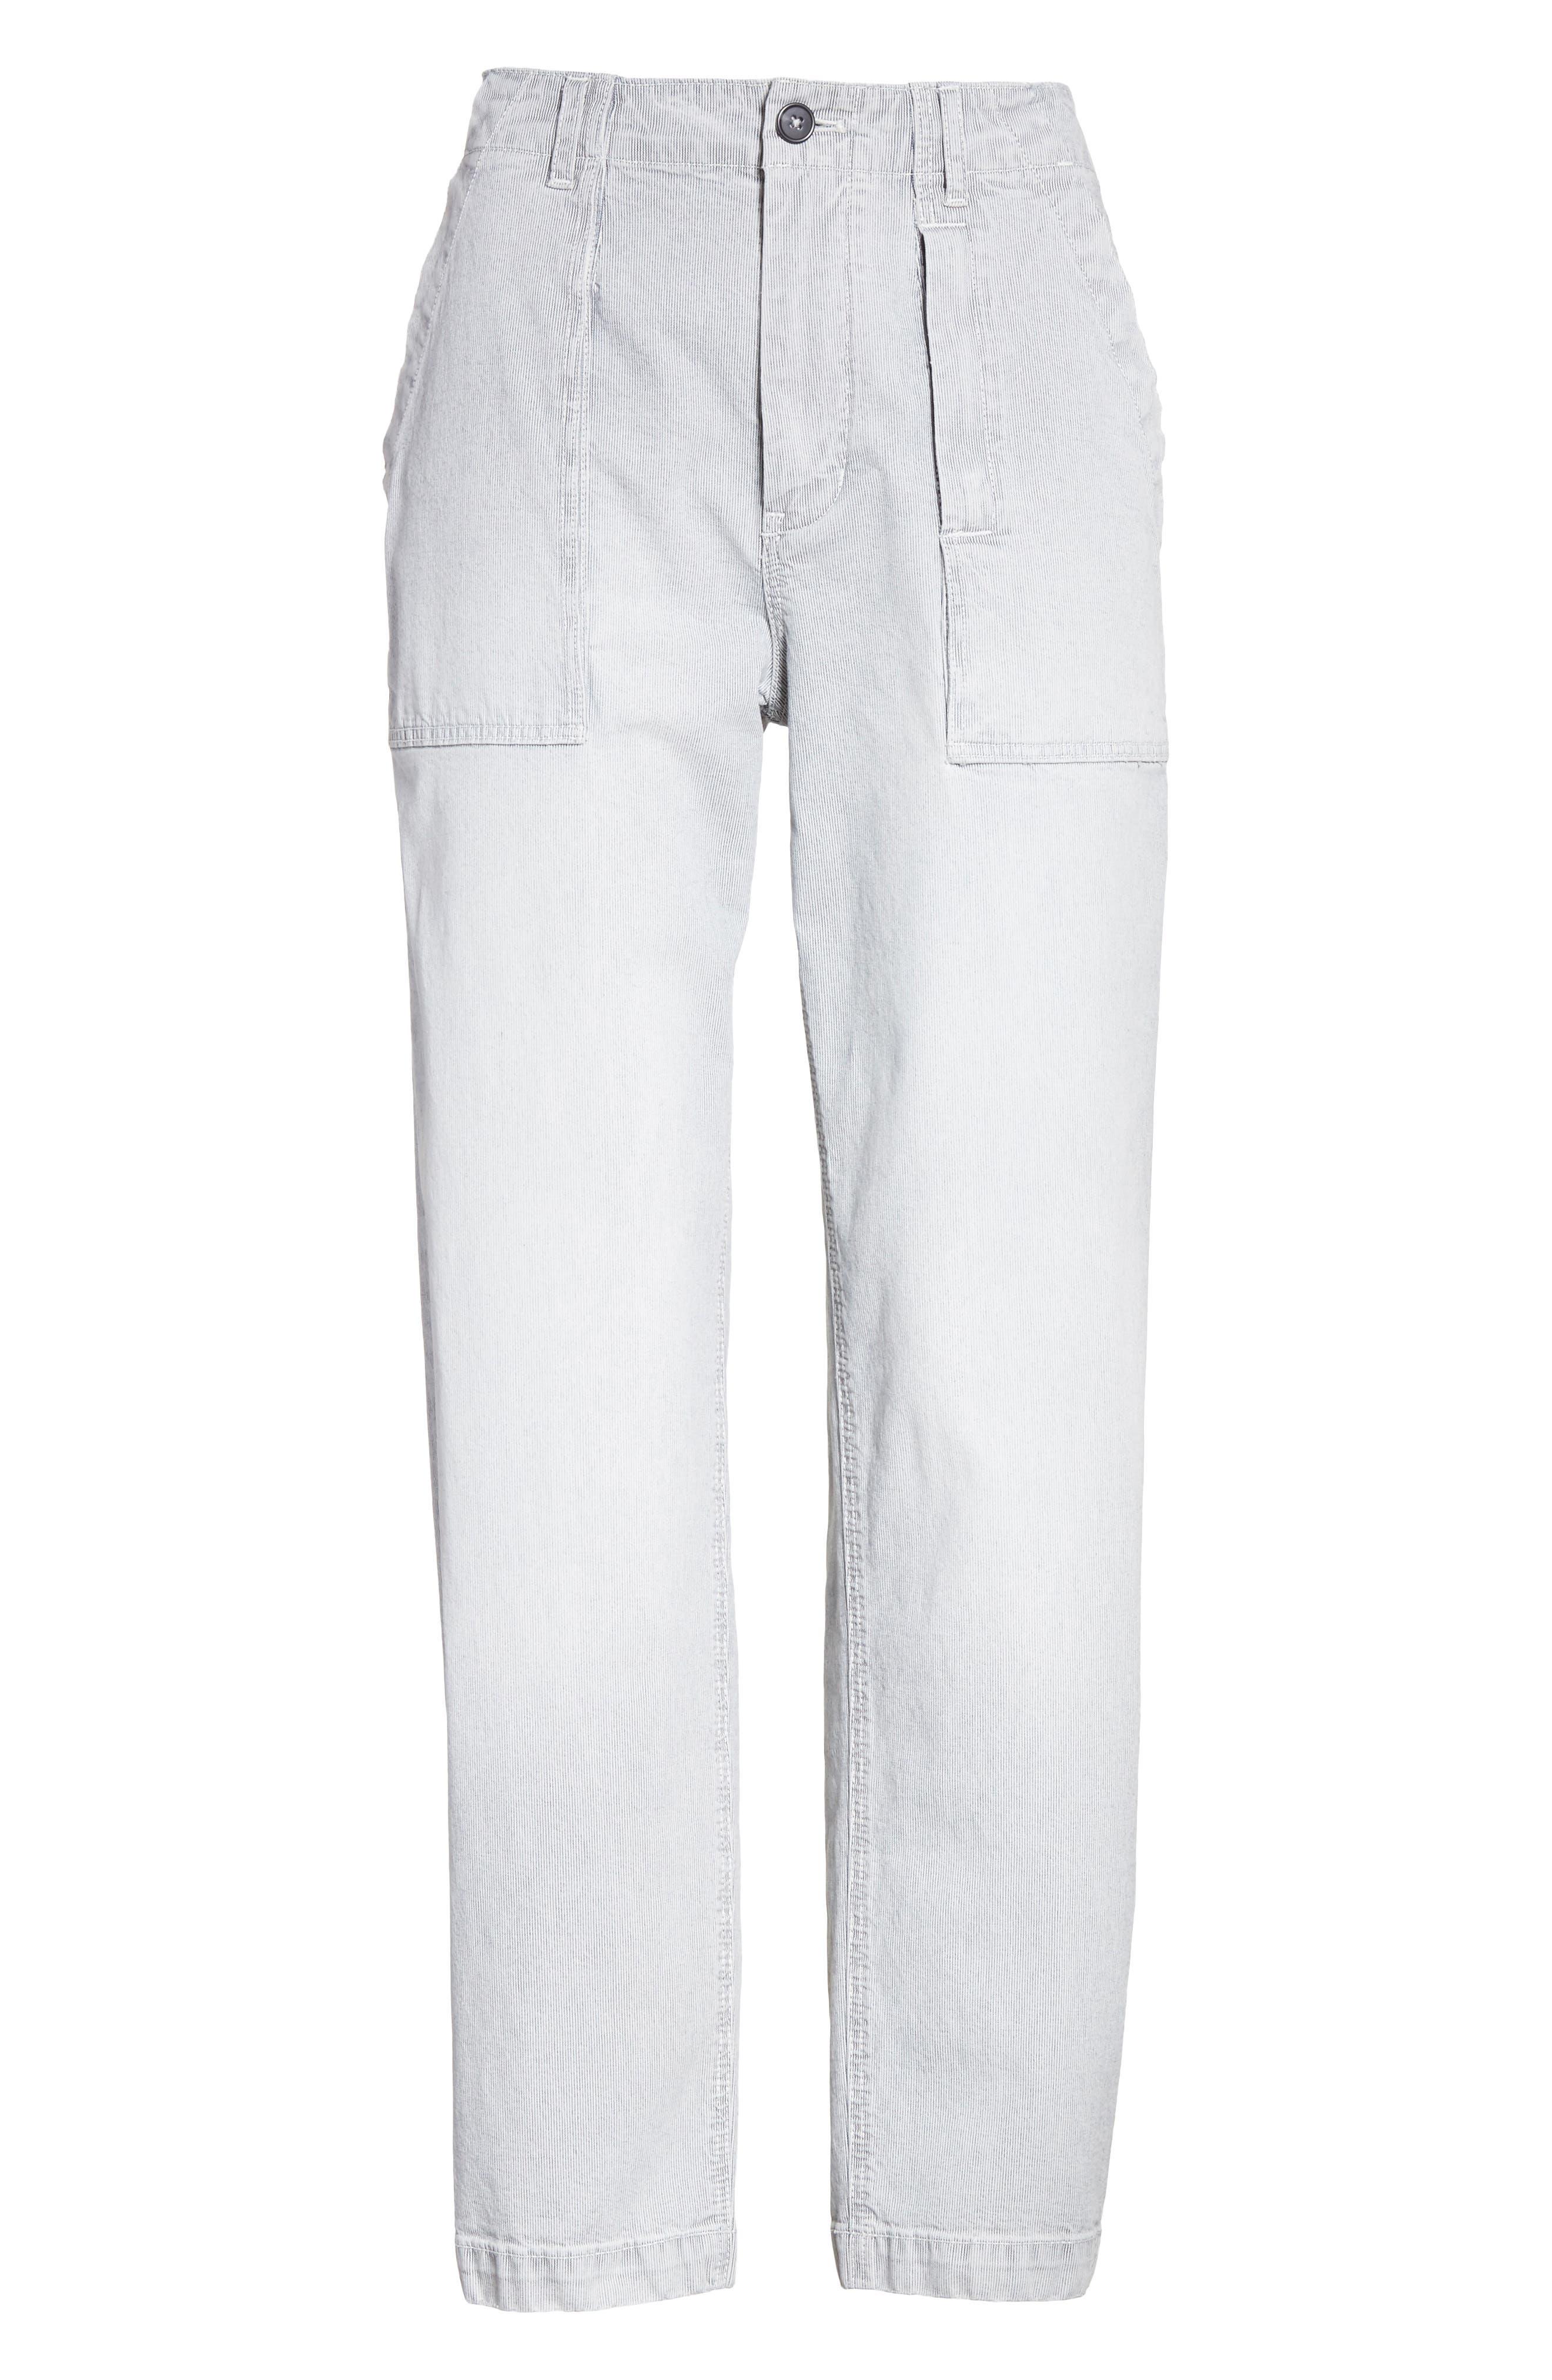 Stripe Ankle Pants,                             Alternate thumbnail 6, color,                             Indigo Combo